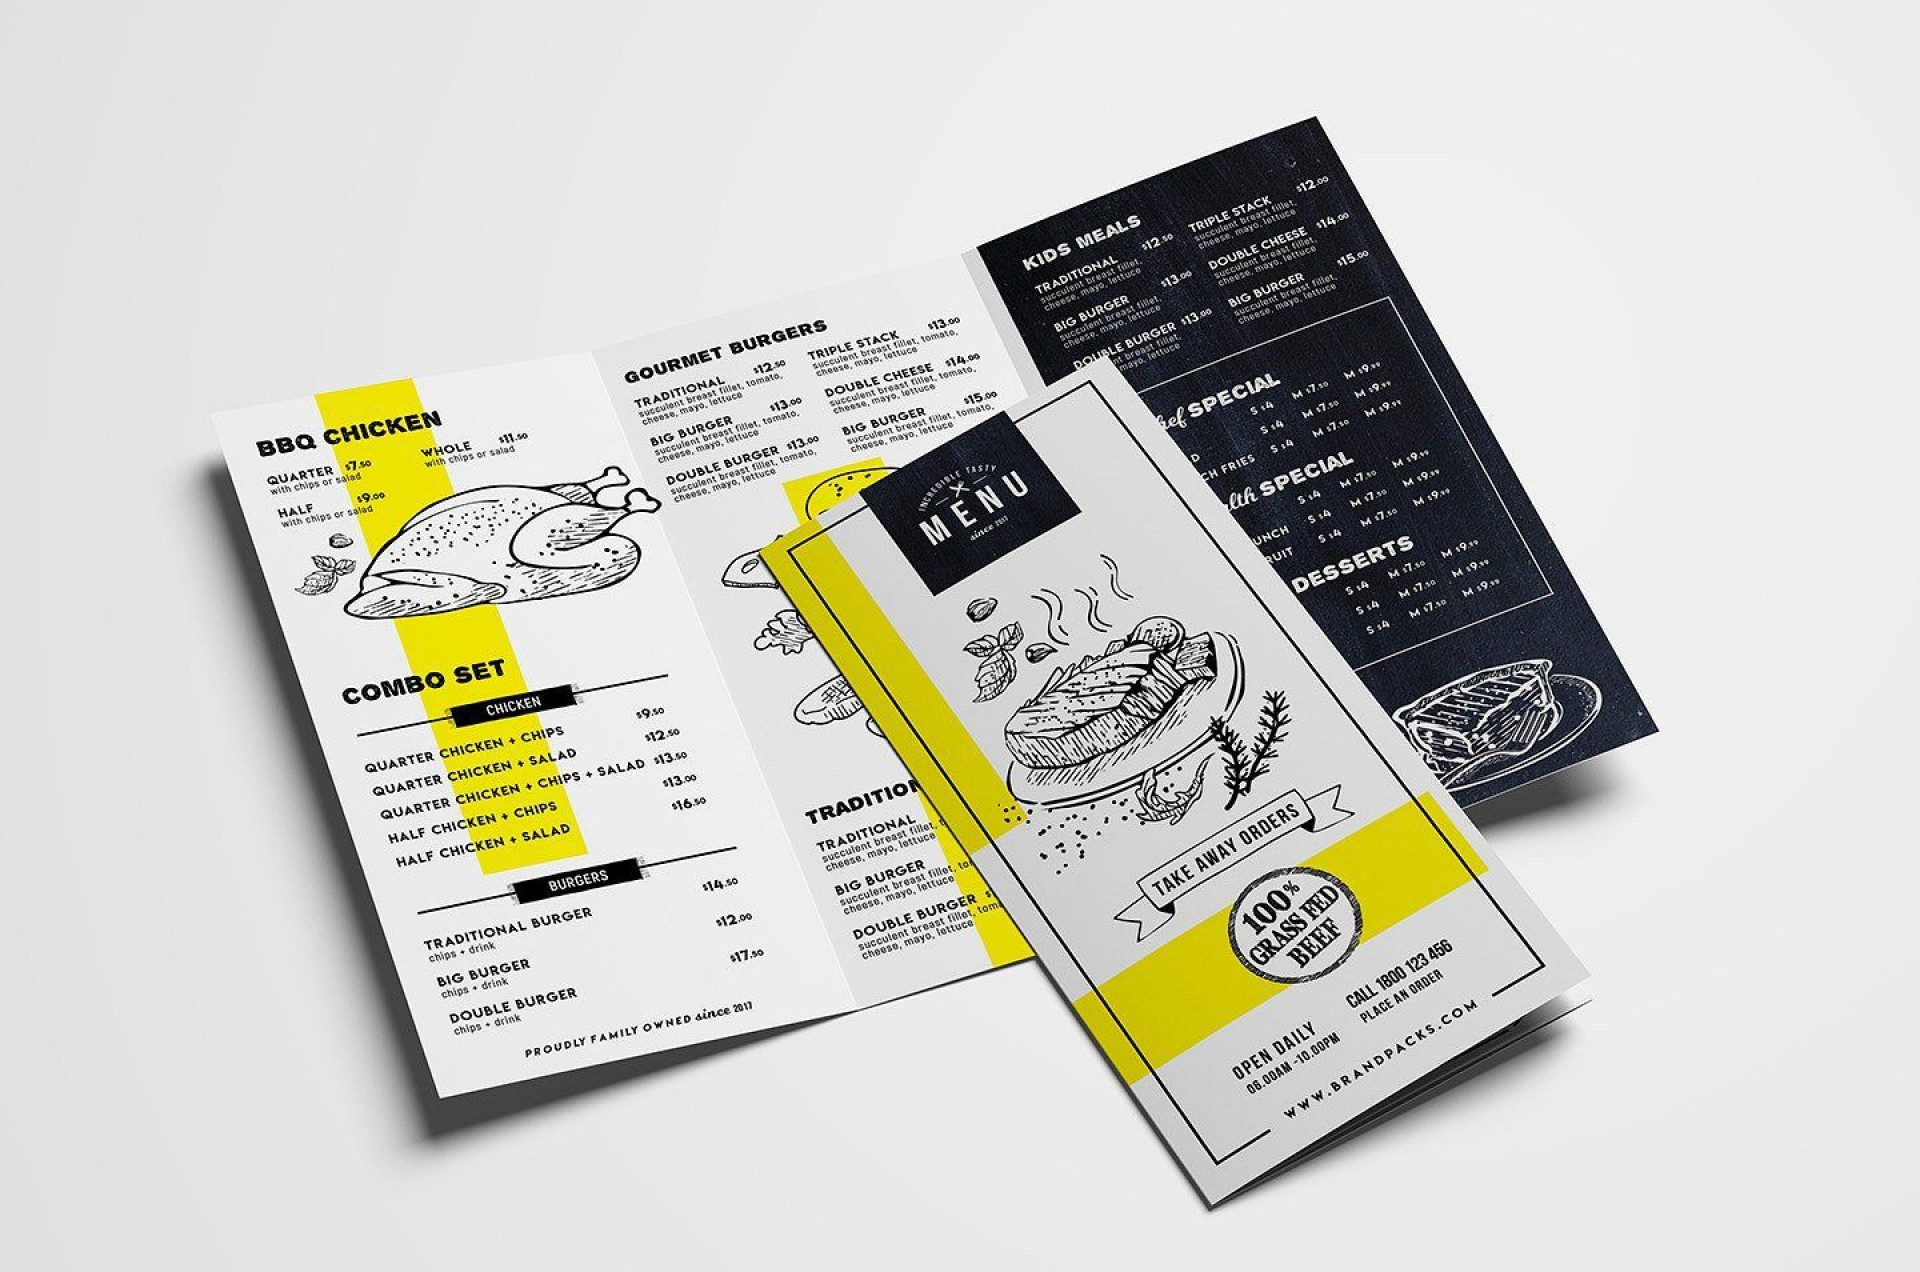 000 Best Tri Fold Menu Template High Def  Templates Restaurant Tri-fold Food Free Psd1920